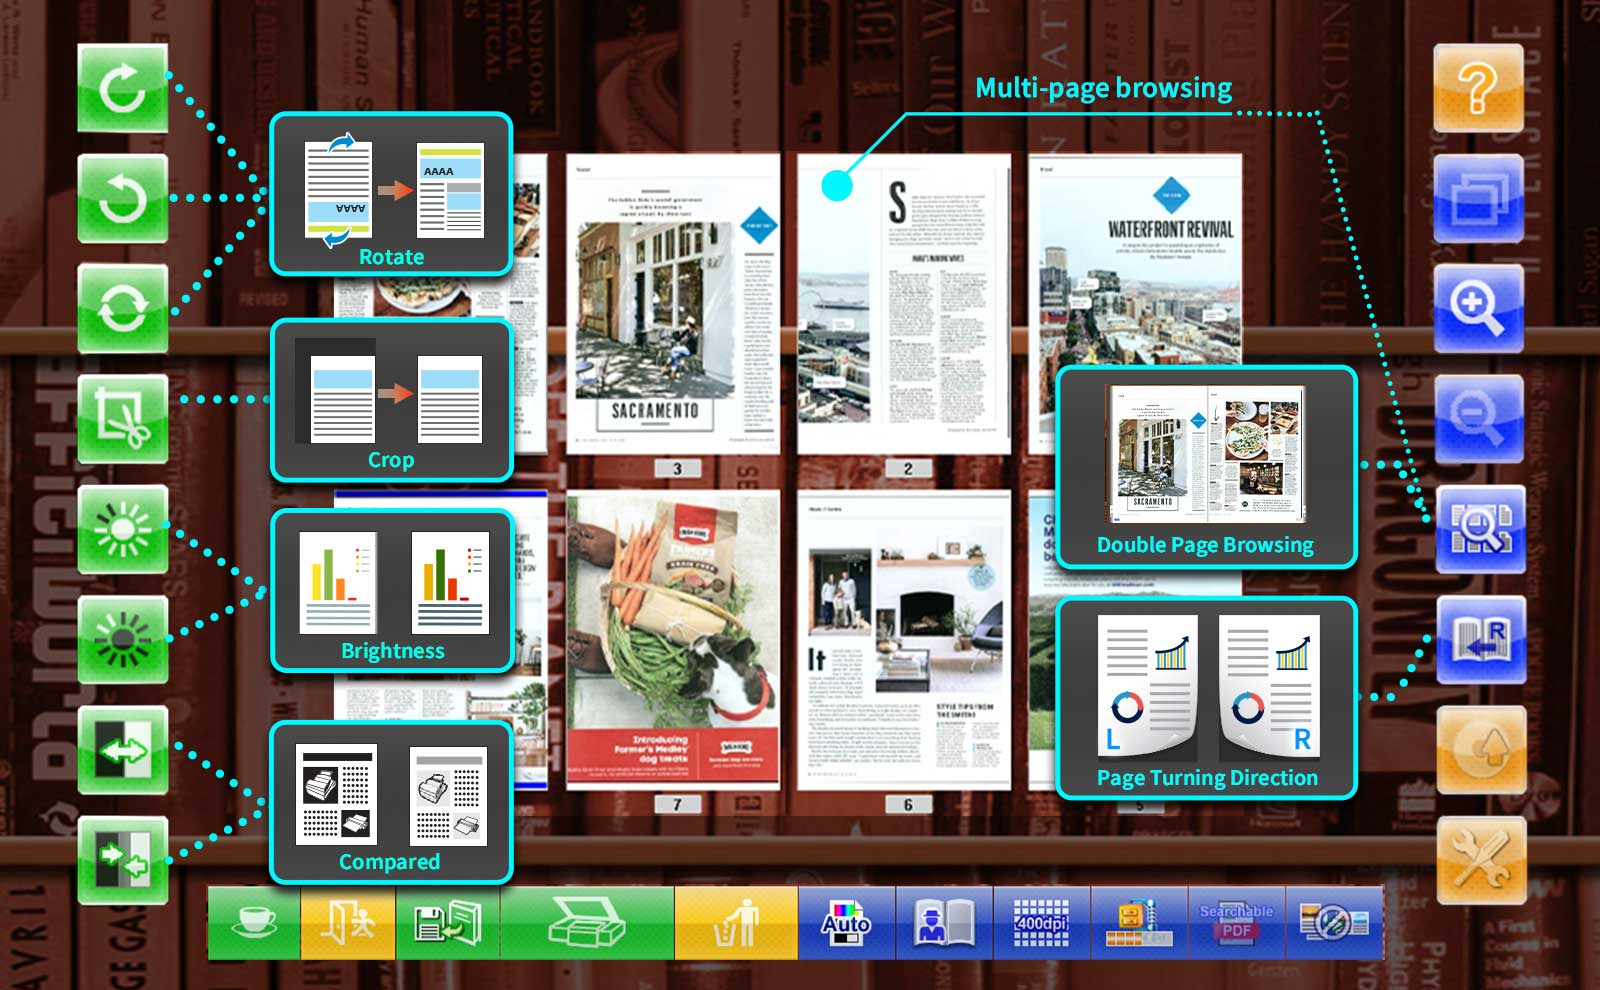 eBookScan image process fuction